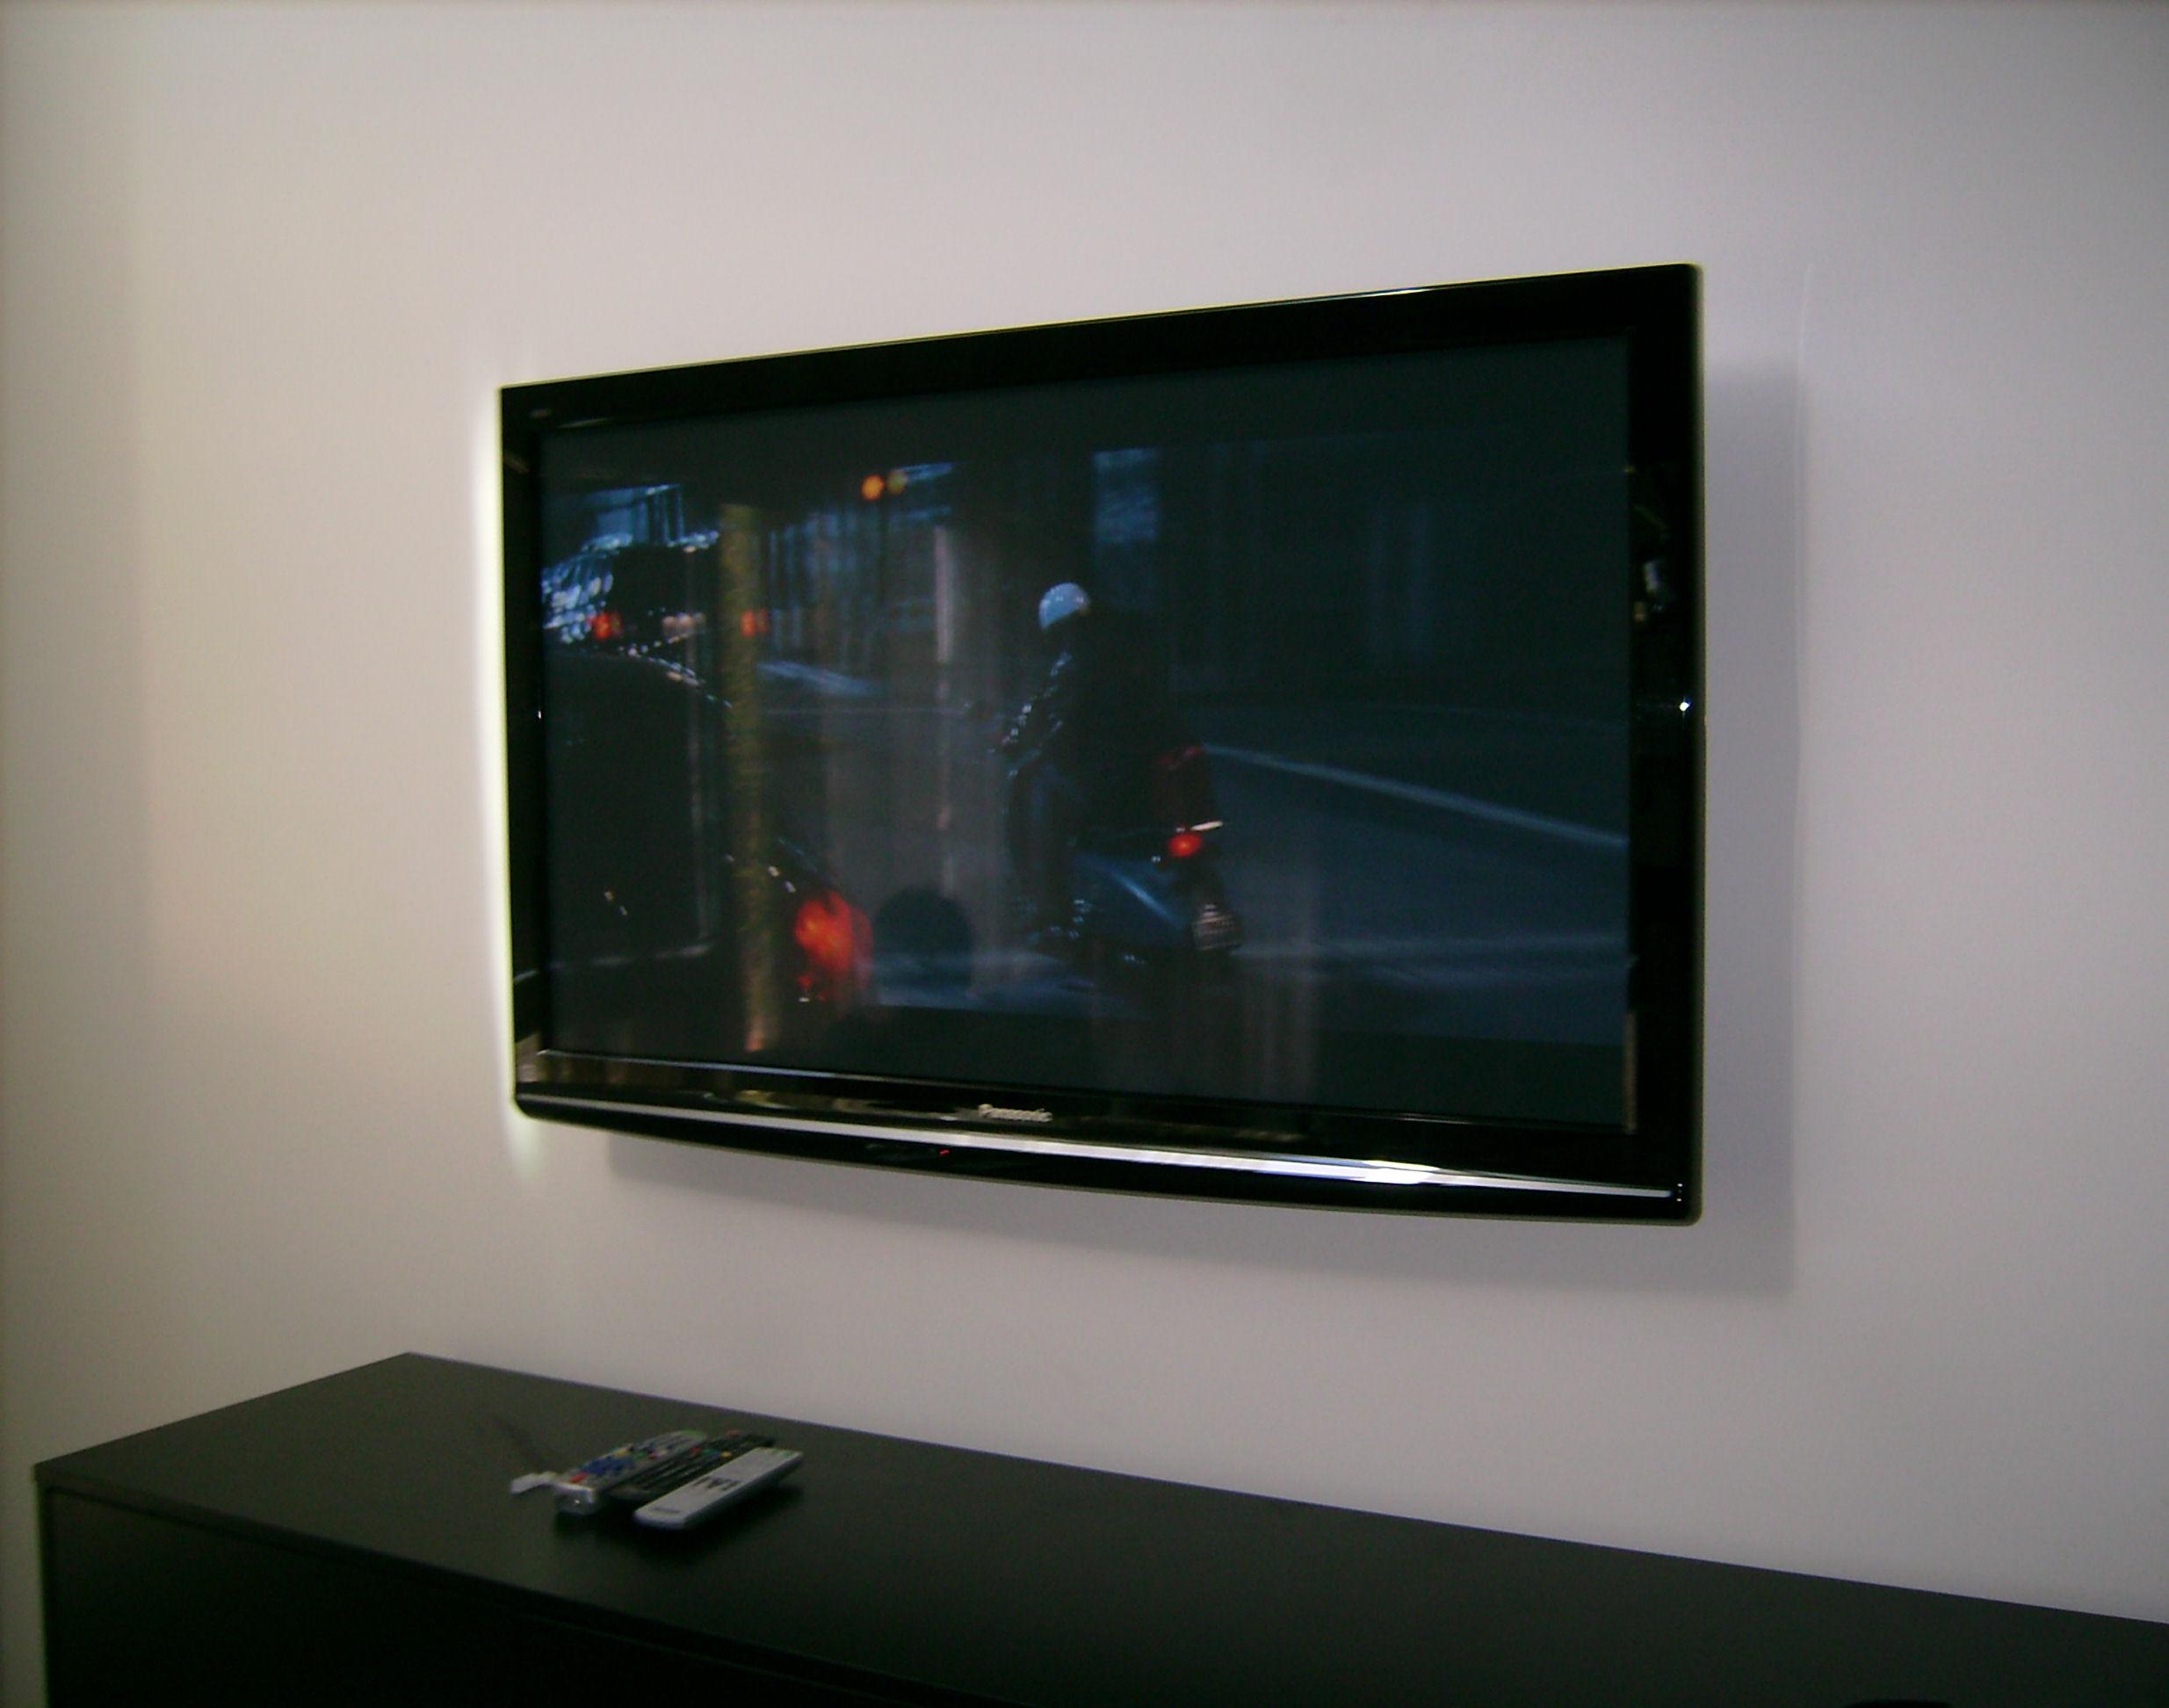 Premium Panasonic Plasma TV Installation